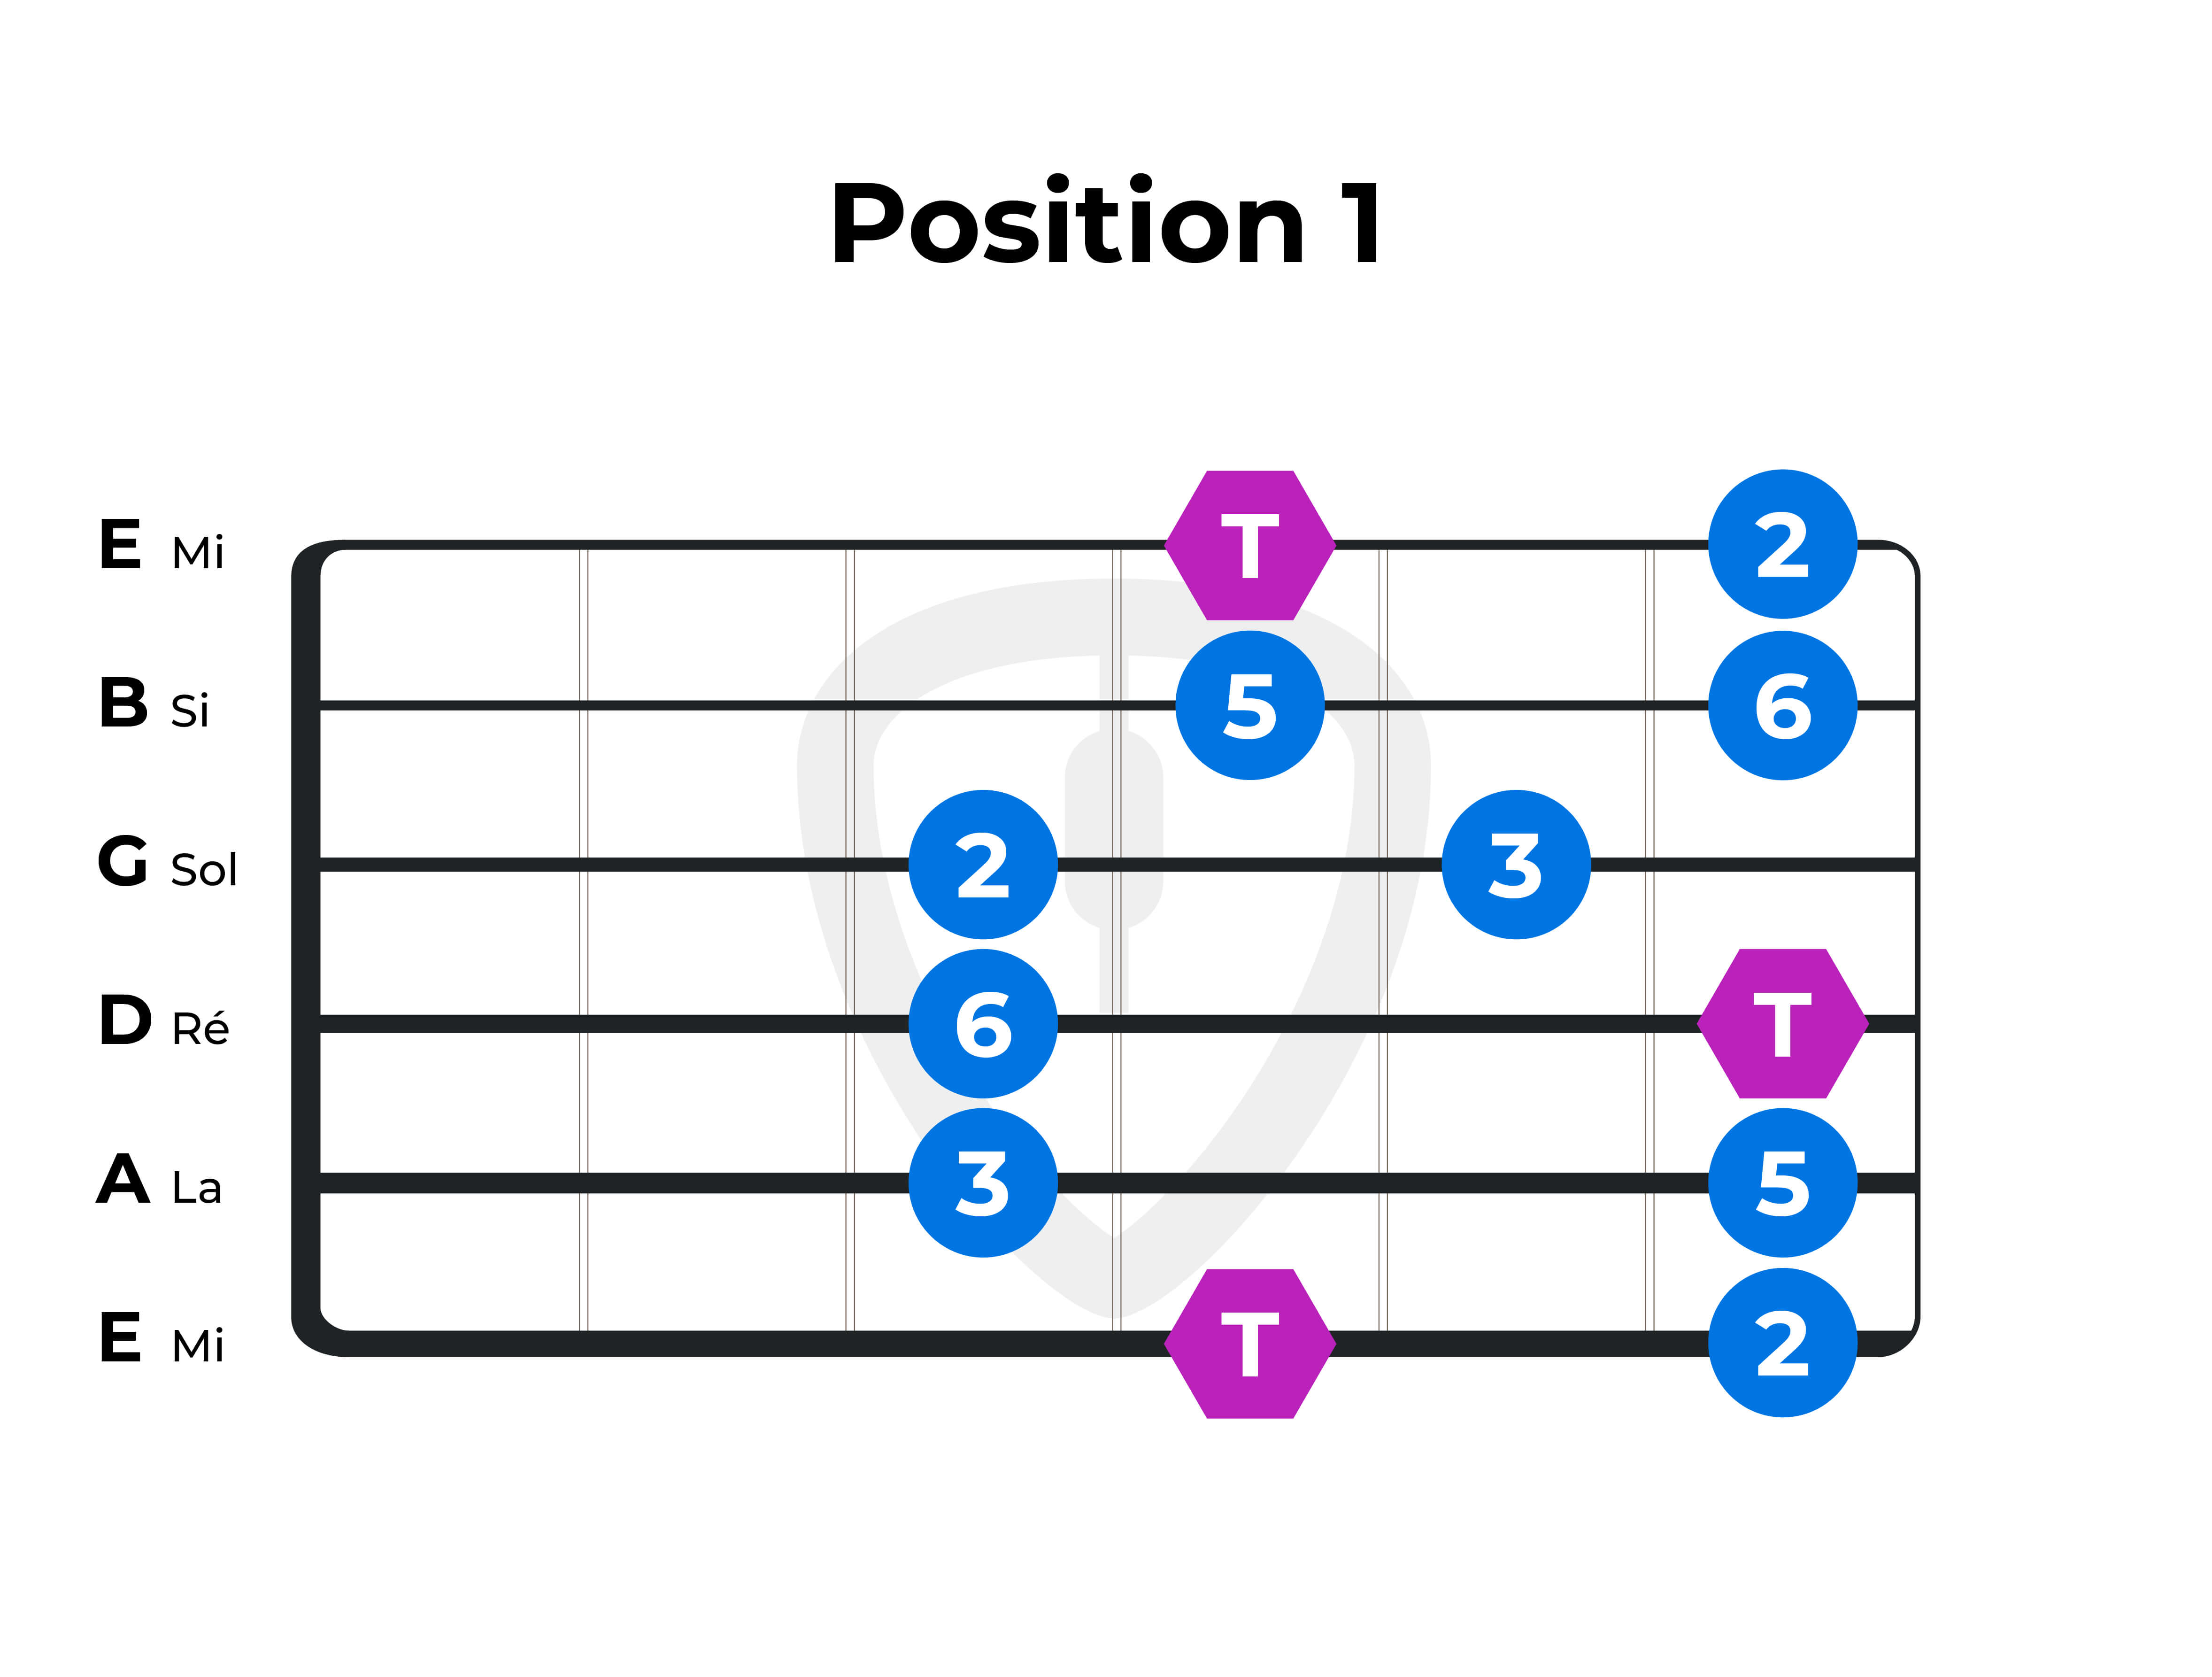 gamme pentatonique majeure position 1 guitare